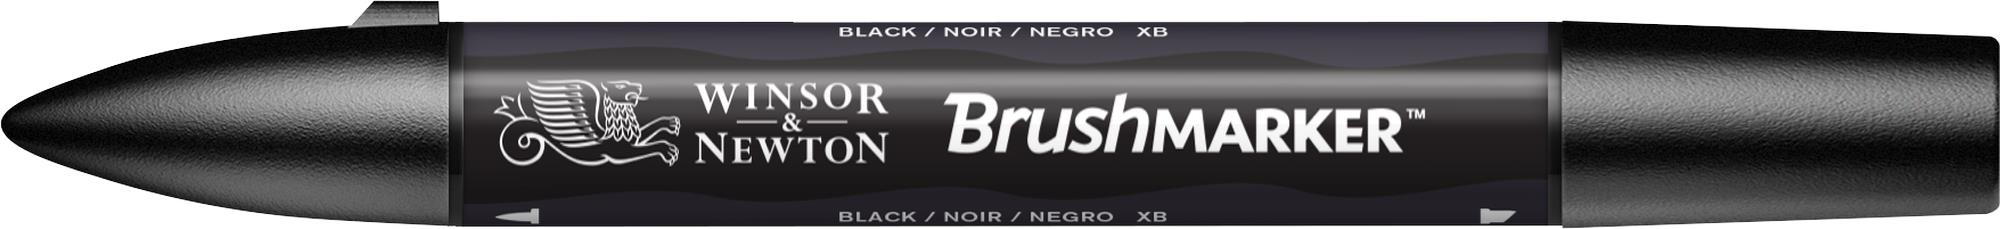 Promarker Brush, Winsor&Newton, 19600789